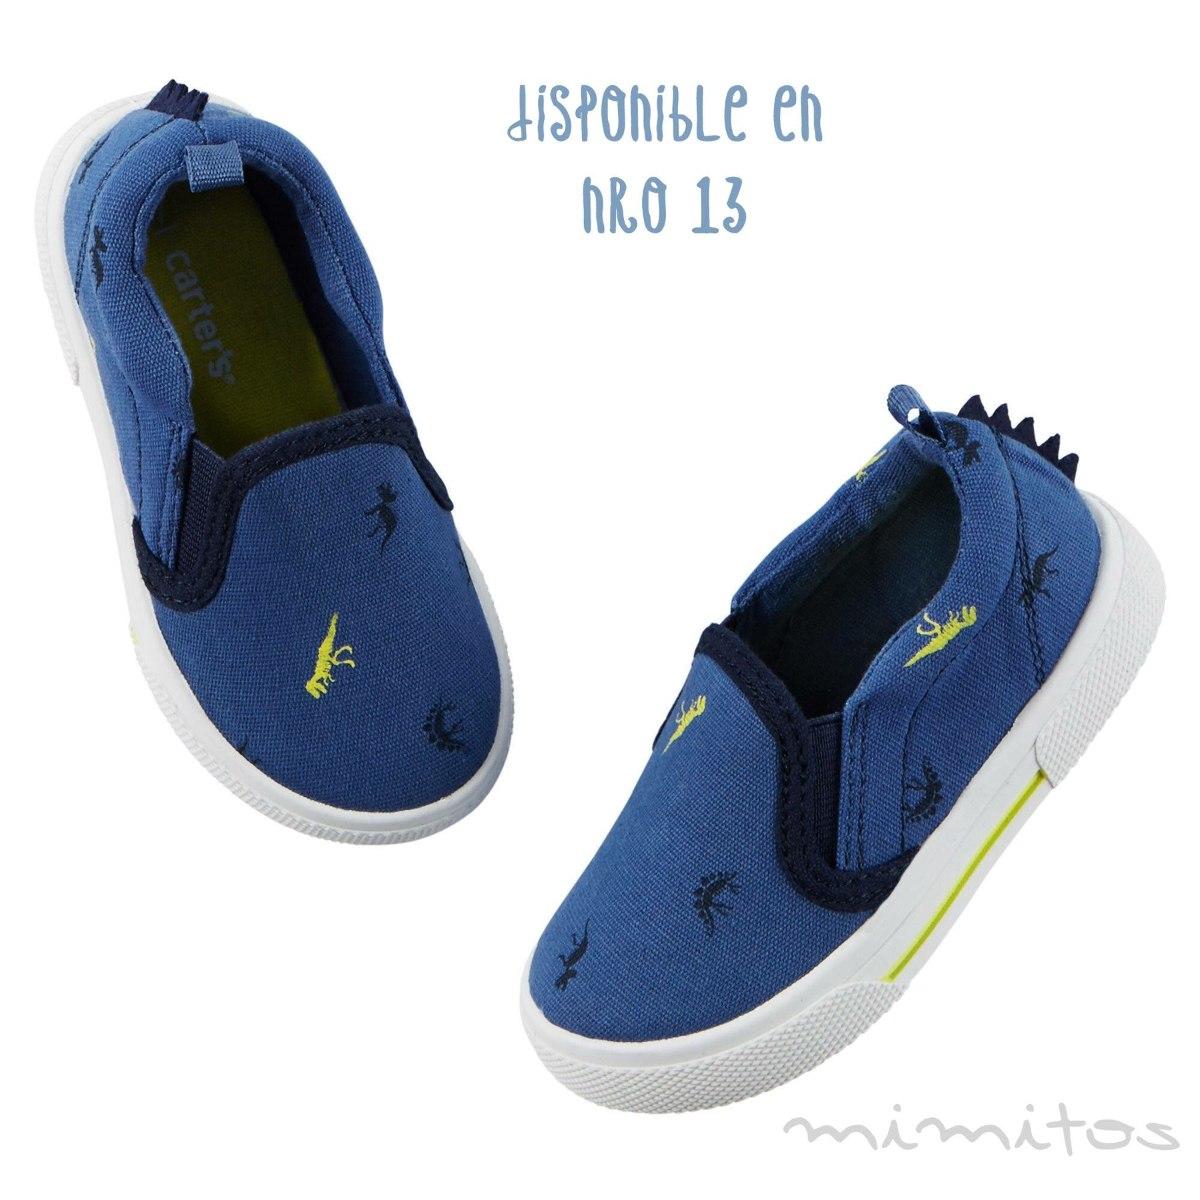 12db03f2d9 zapatillas para ninos mercadolibre,Zapatillas Basquet Topper Nino Madball 5  Original